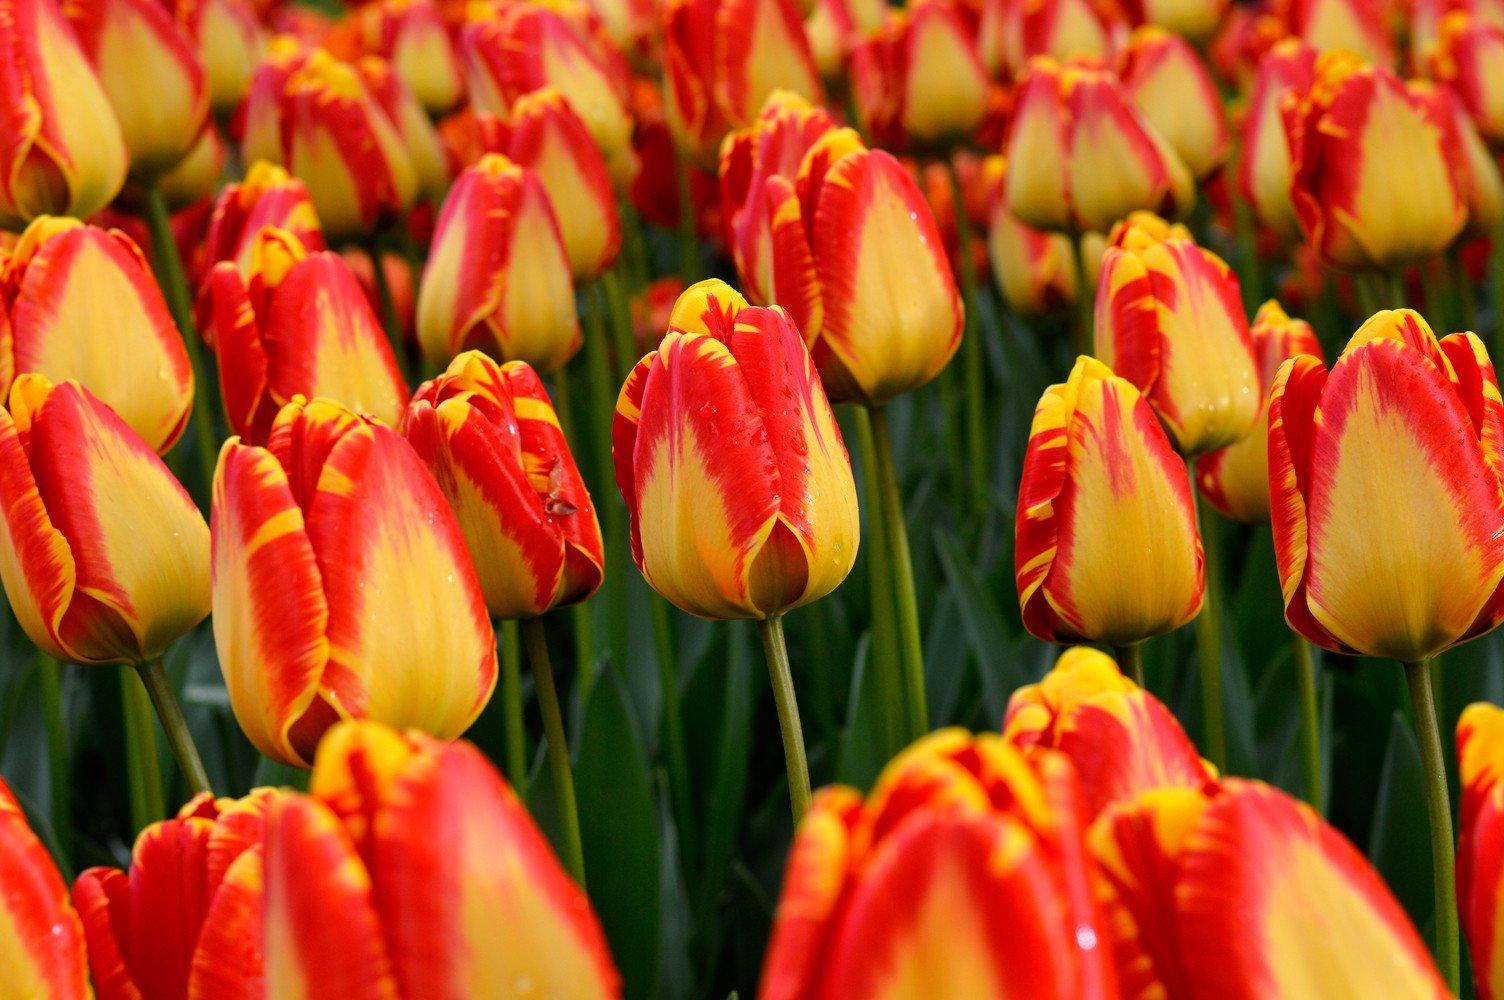 10 Banja Luka Tulip Bulbs Tulipa Quality Blooming Size 12+ cm Fall Planting by thecountrygardenshop